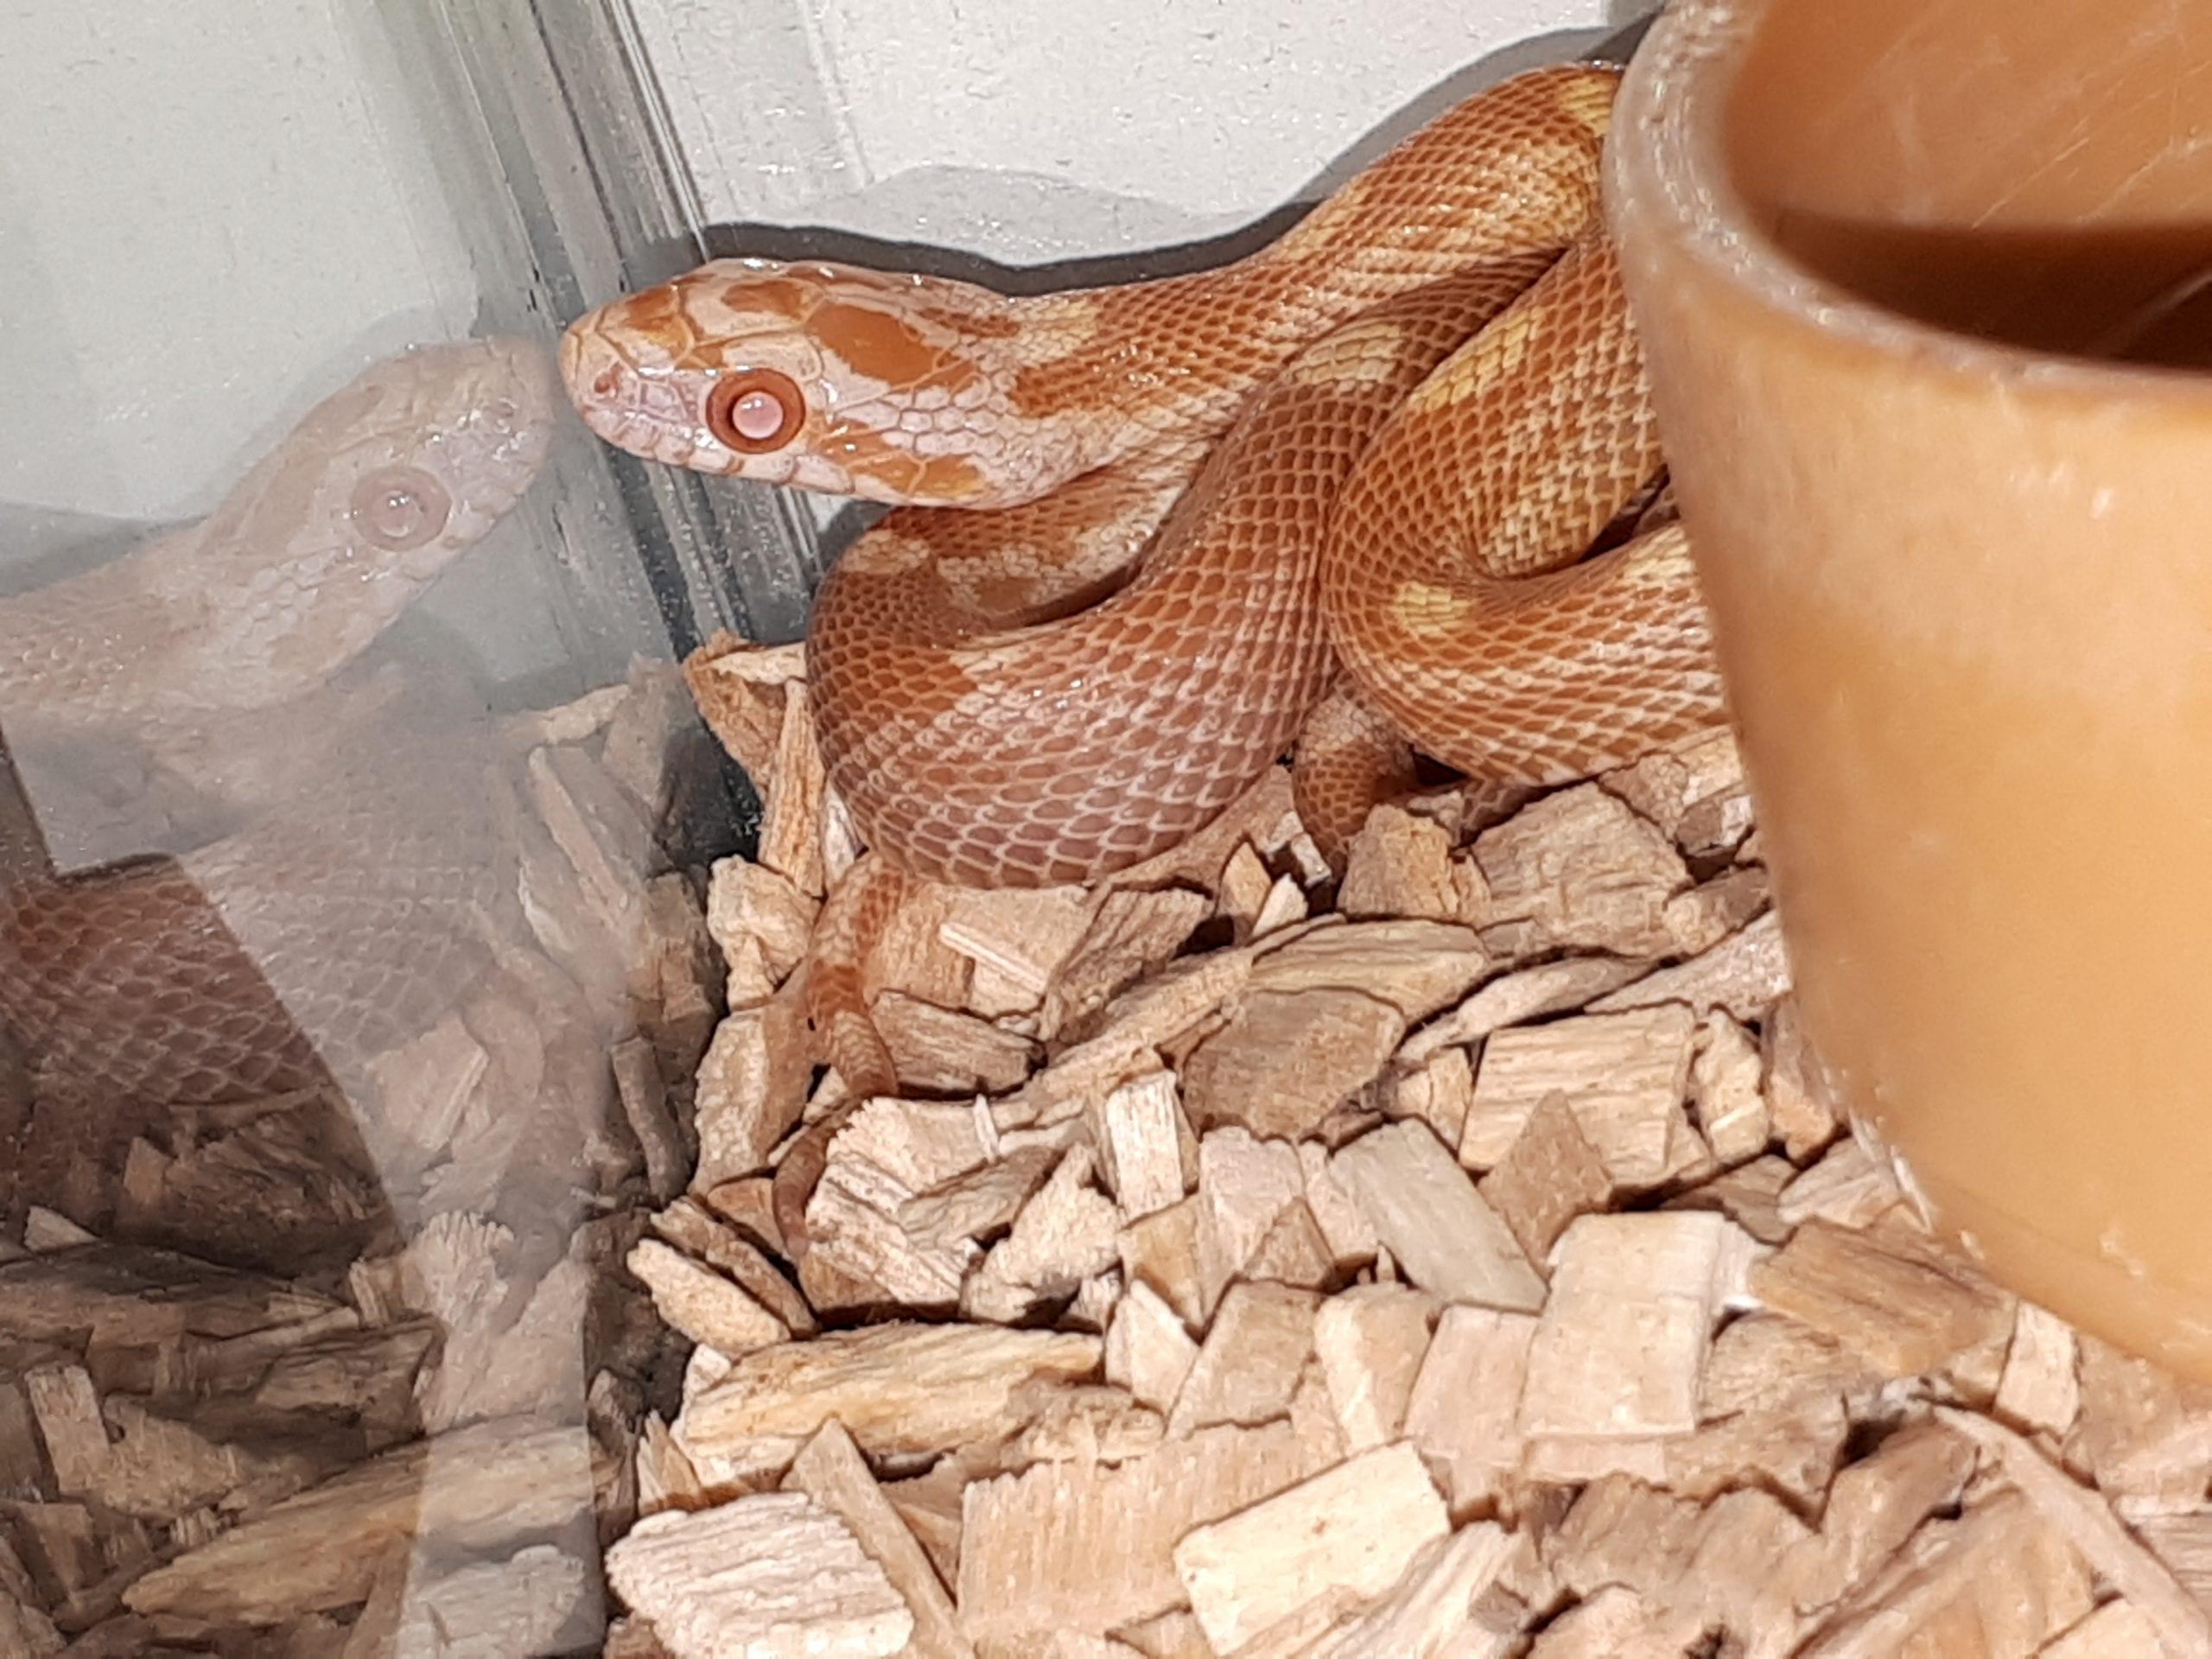 Butter Motley Corn Snake CB (Pantherophis guttatus) Image